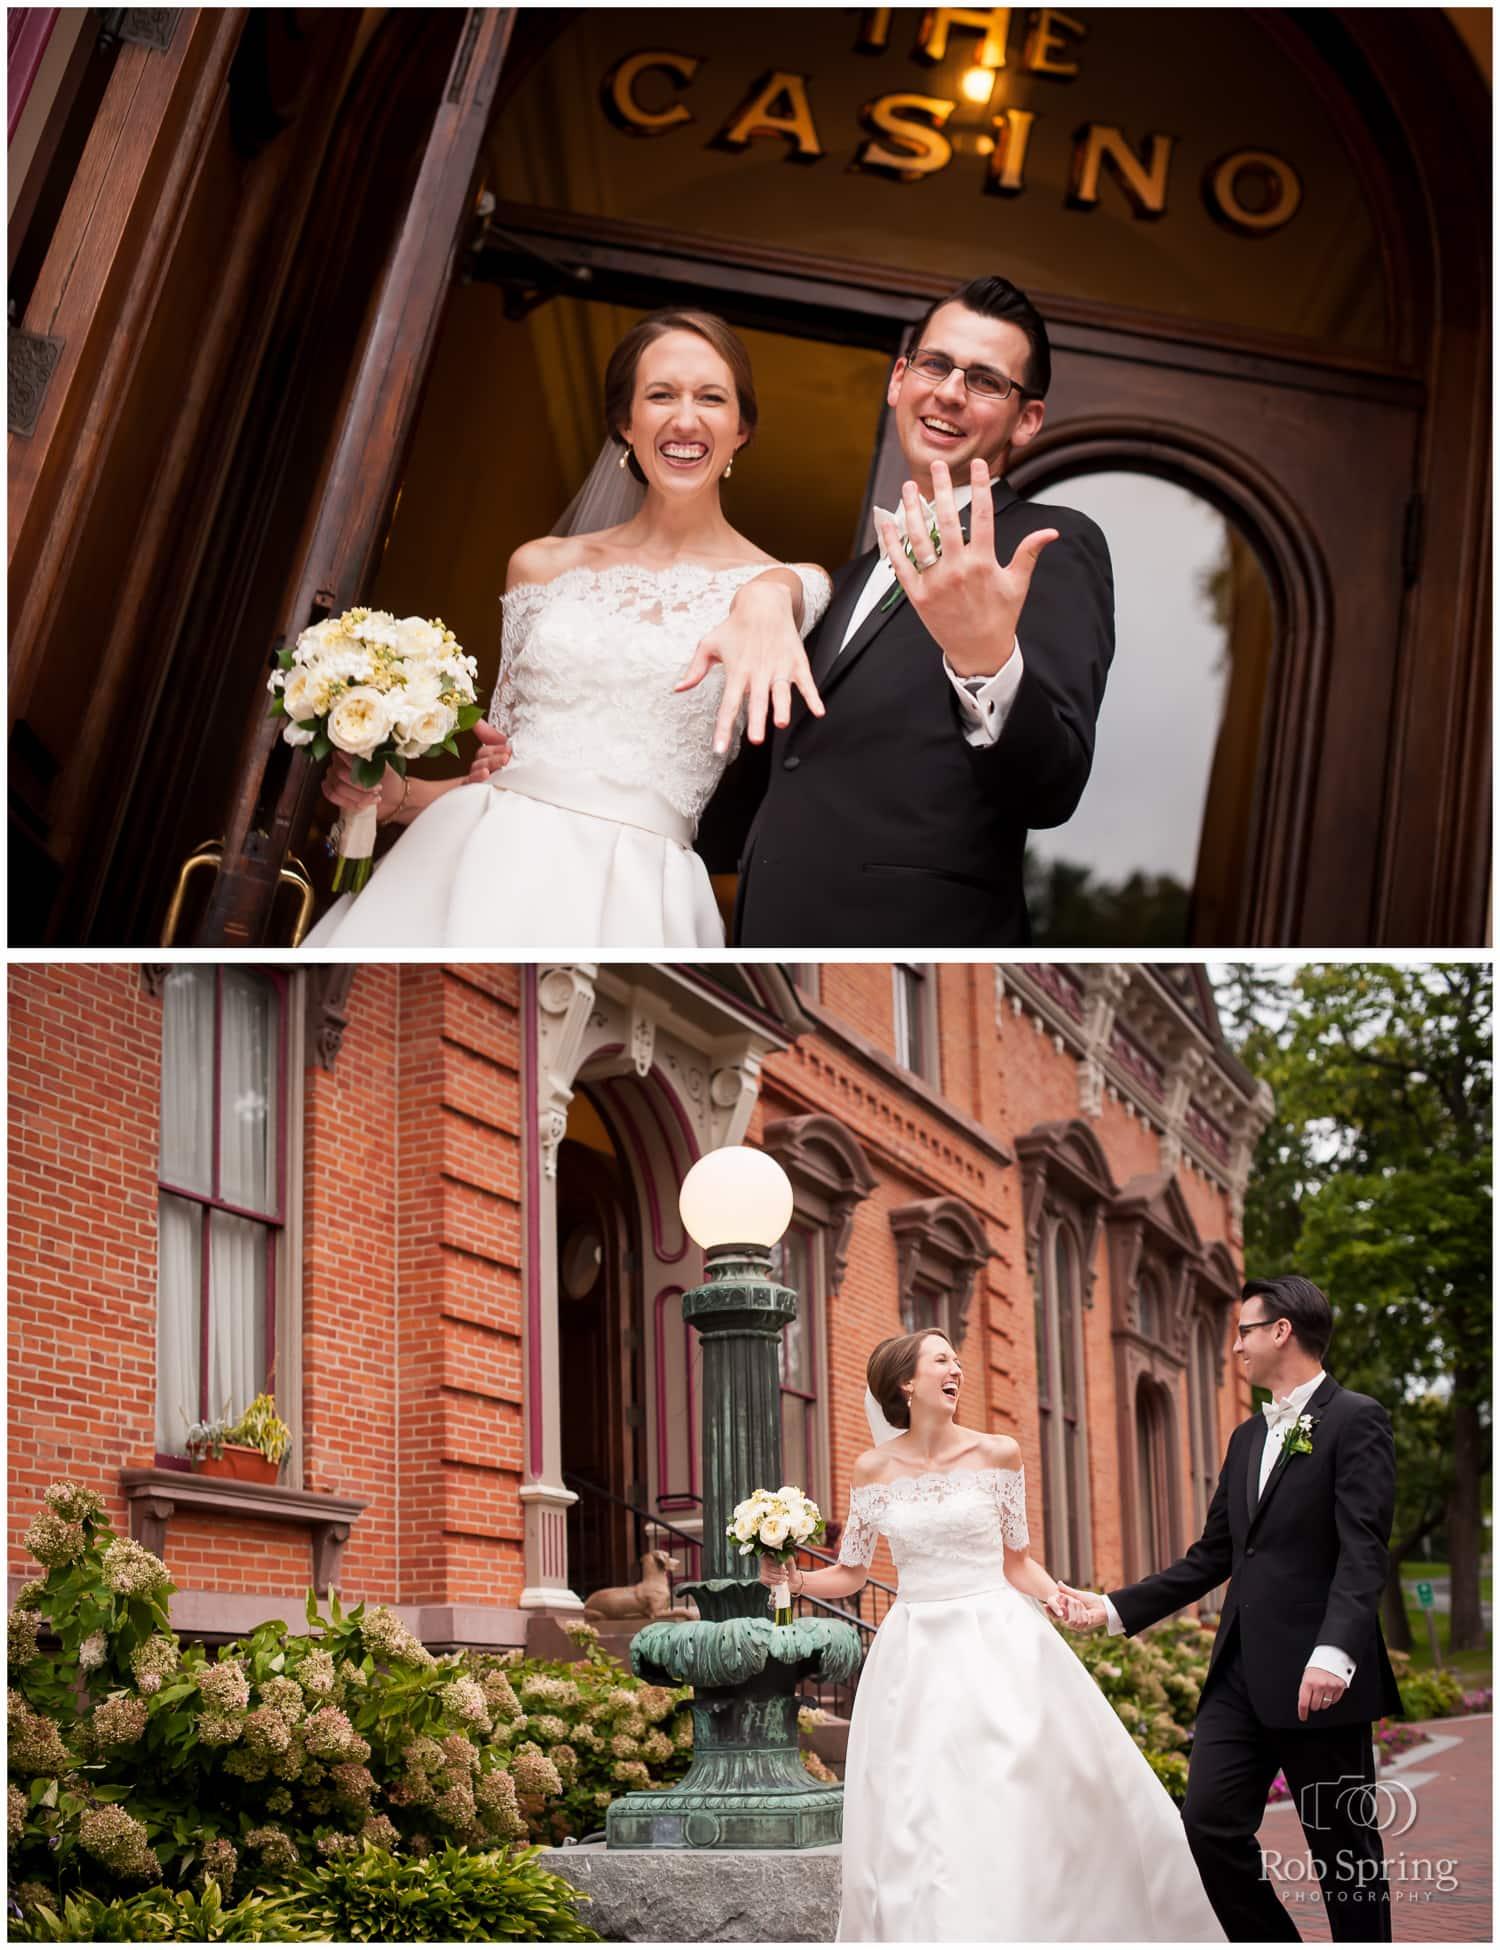 happy, smiling bride and groom, Saratoga Springs, NY Wedding photos